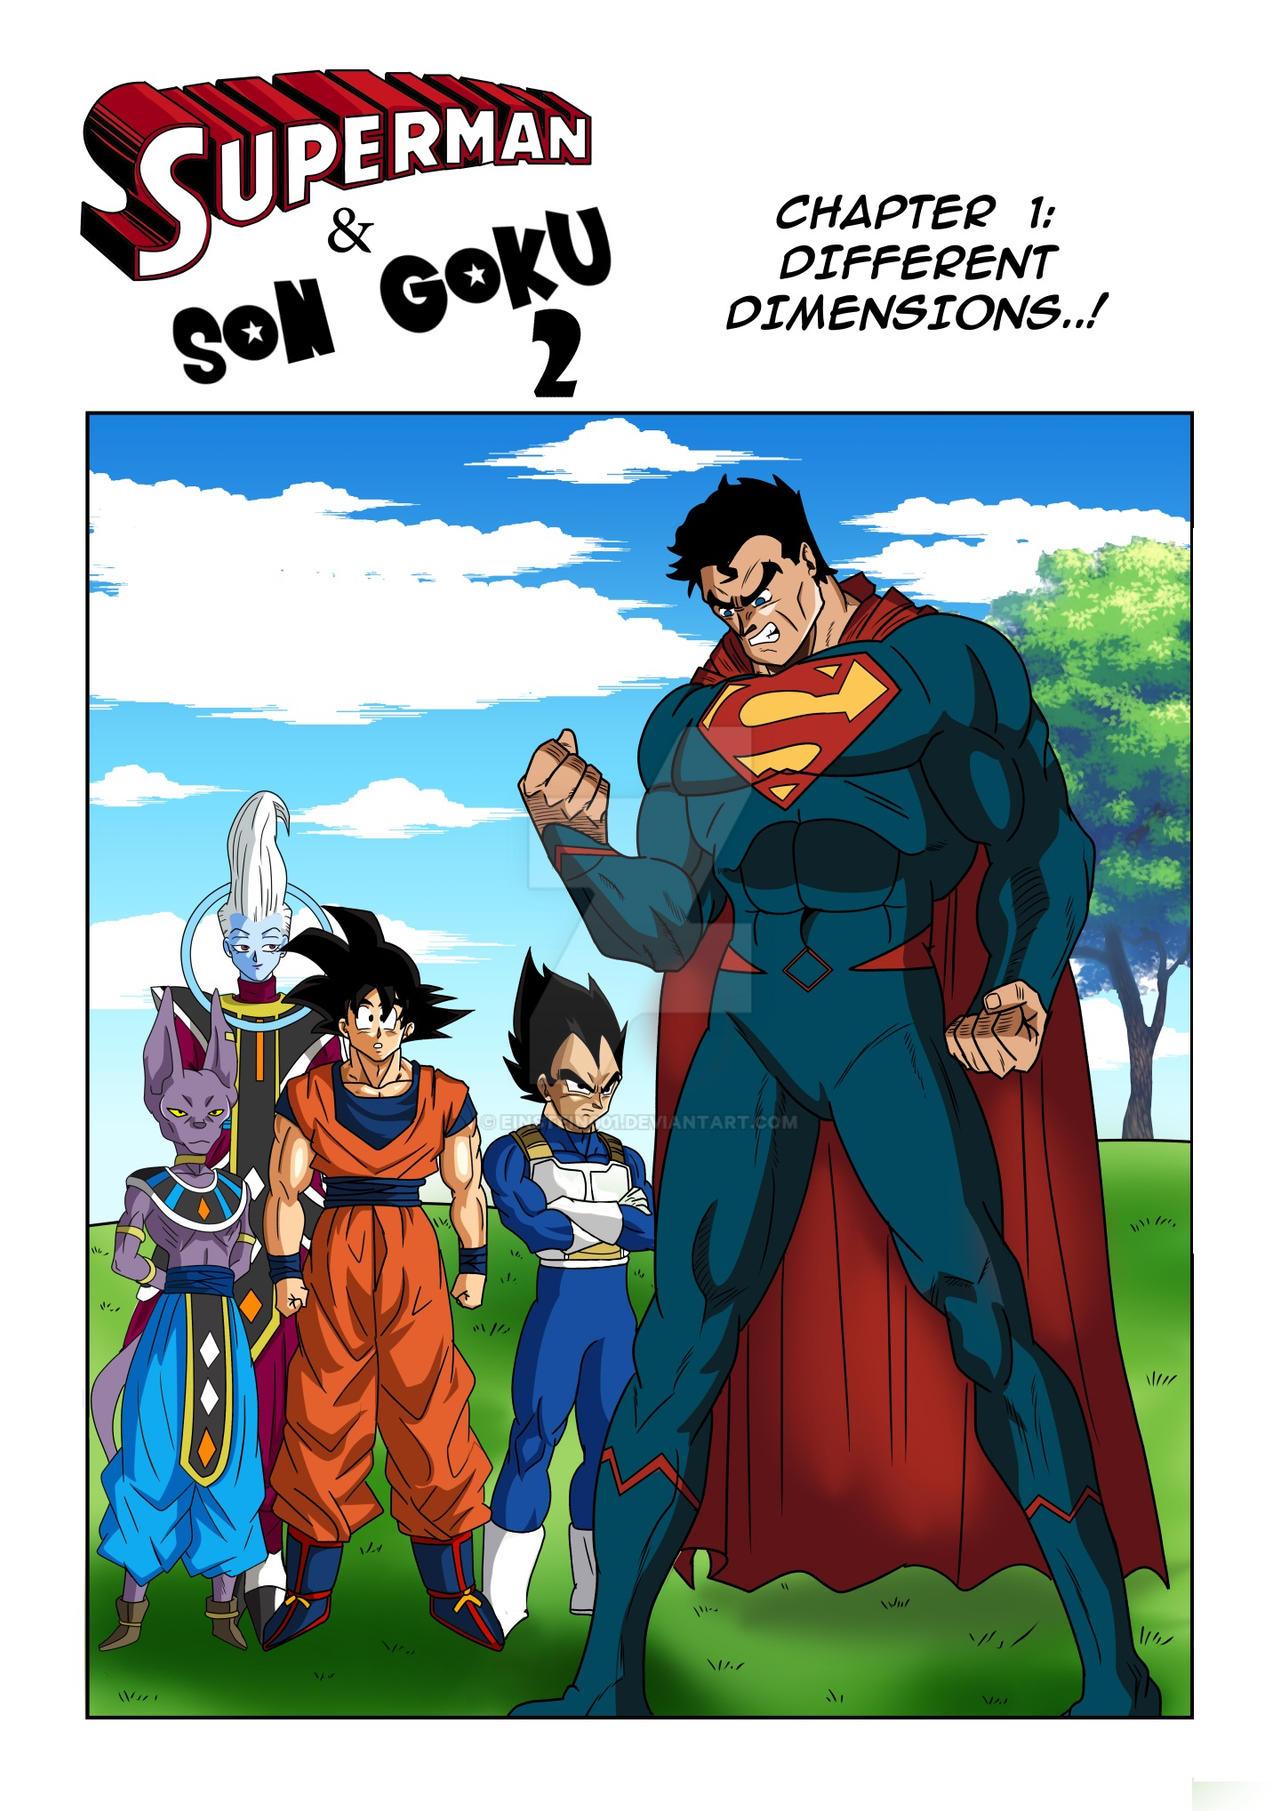 [Fan Manga] Son Goku and Superman 2 • Kanzenshuu